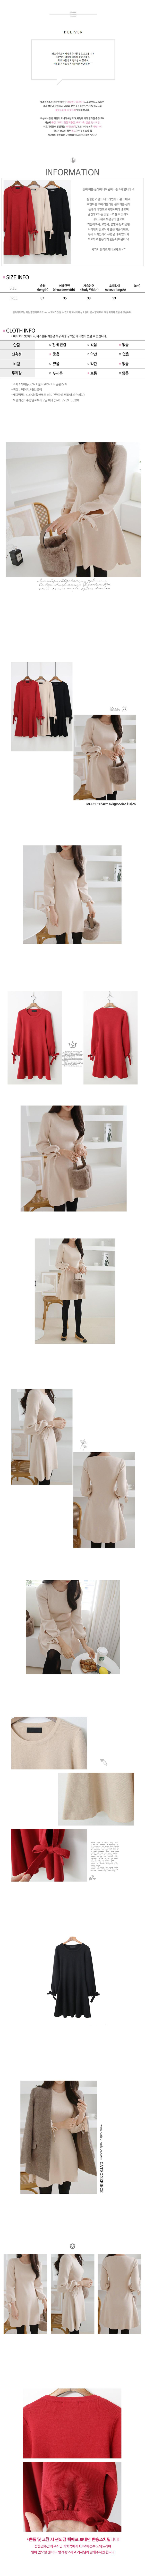 Guest Knit Dress